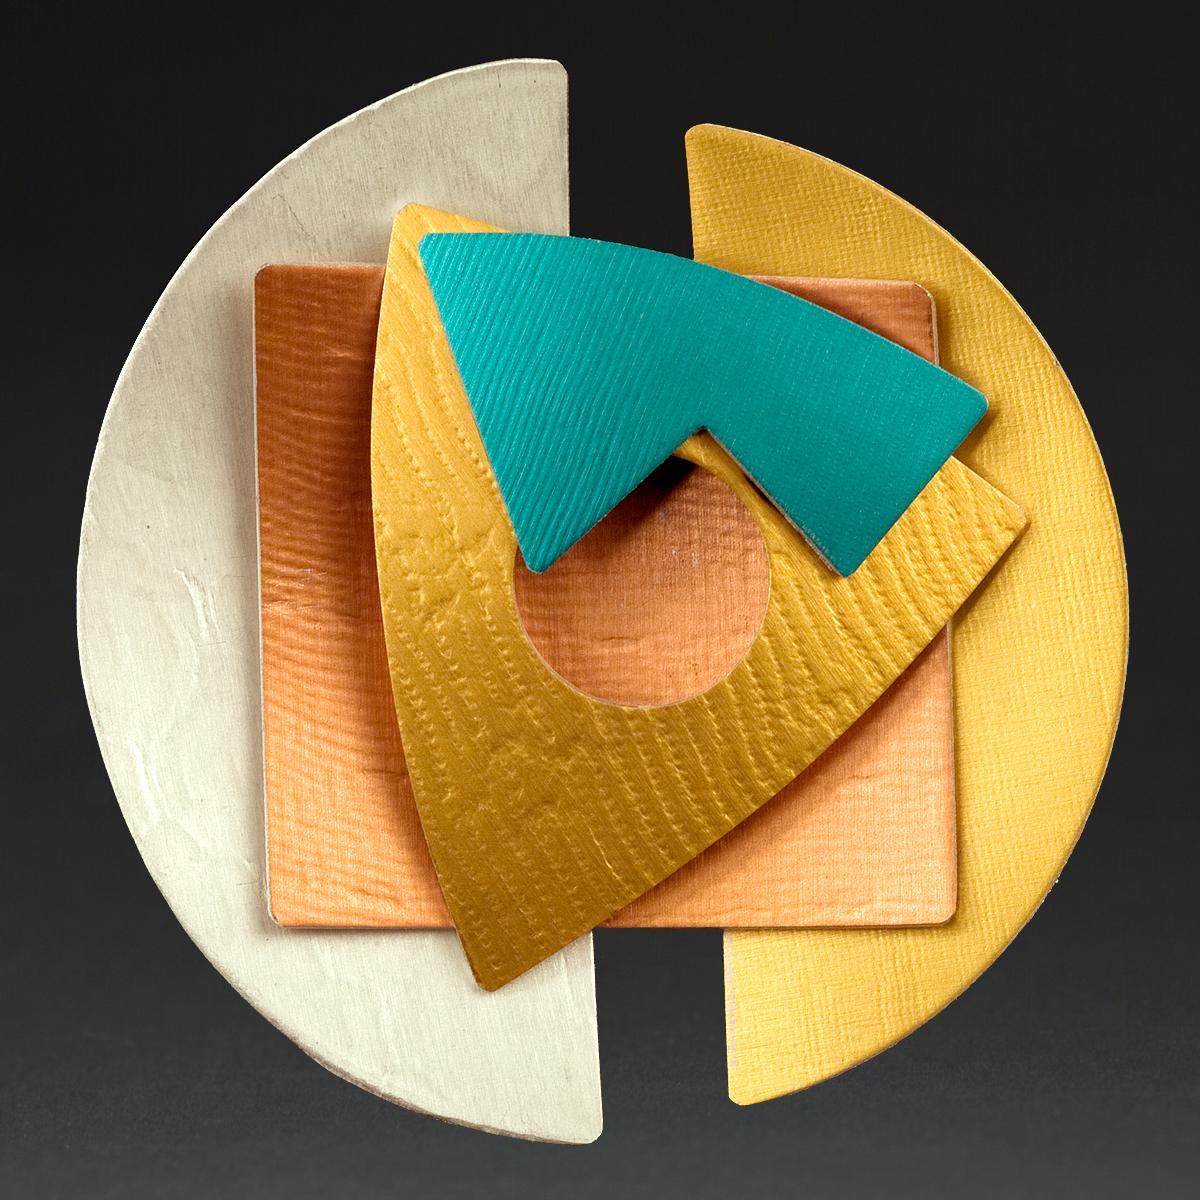 B - Chablis, Rust, Gold, Turquoise, Orange